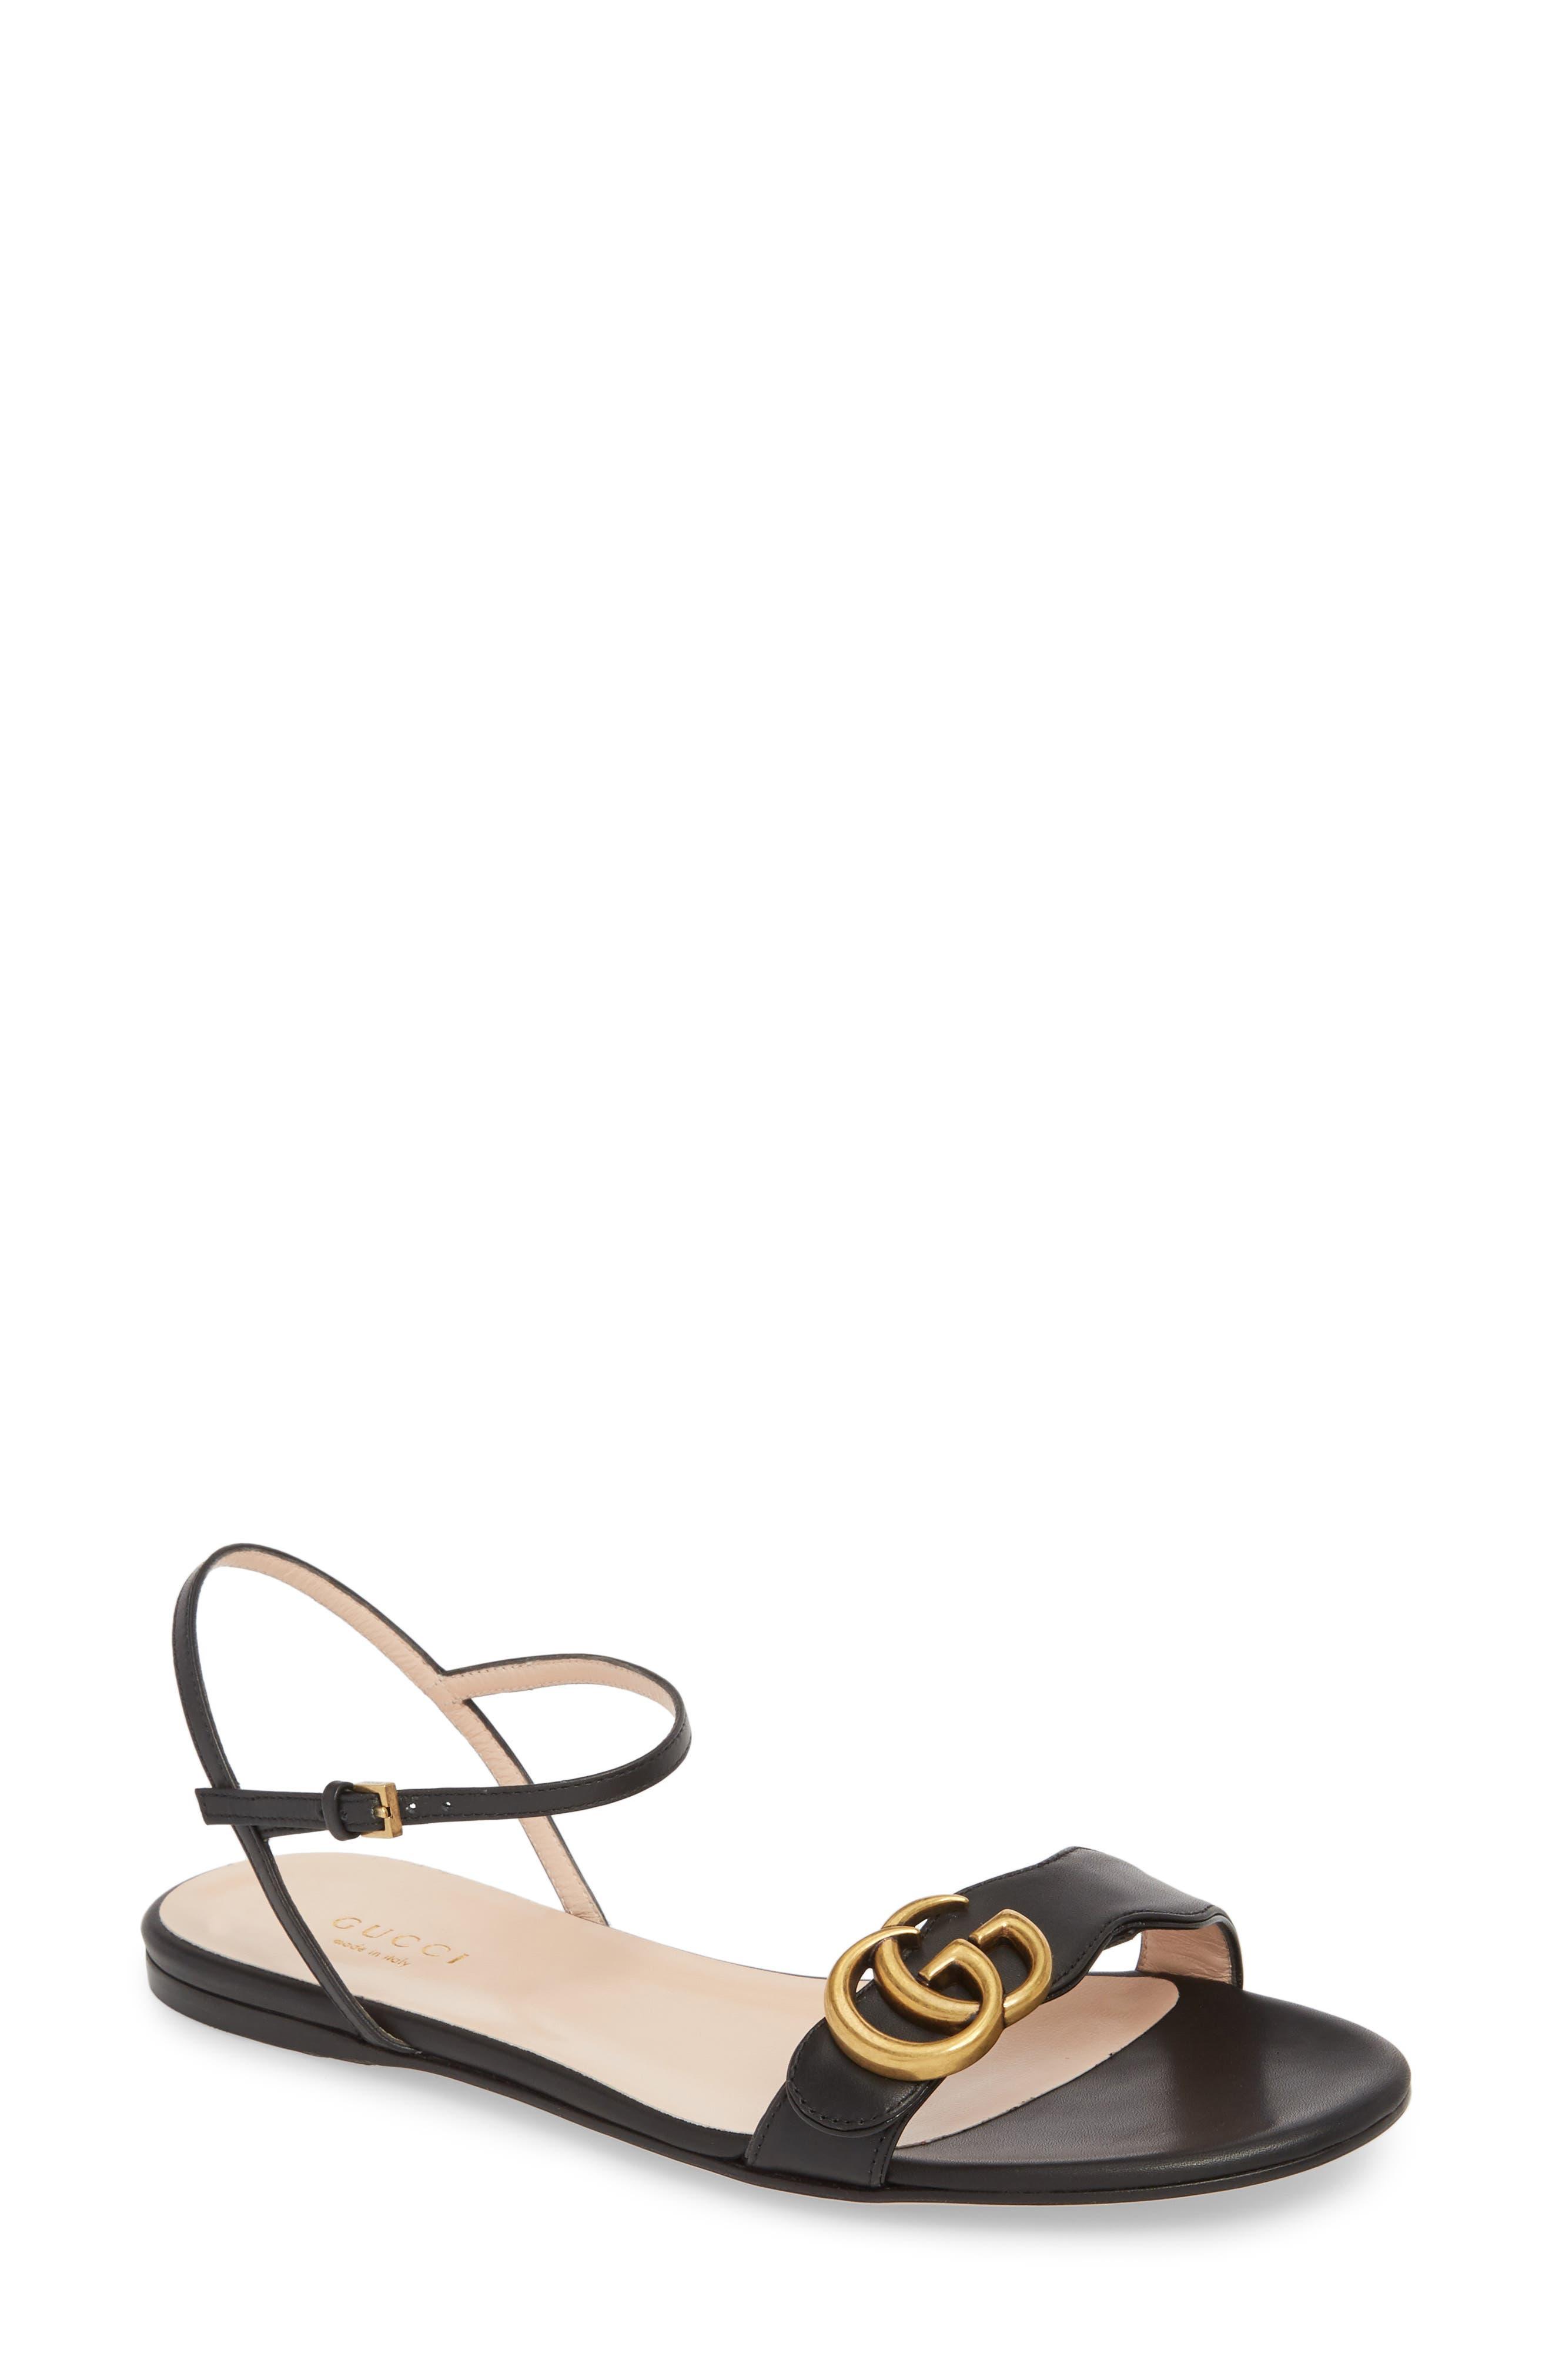 Gucci Marmont Quarter Strap Flat Sandal (Women)